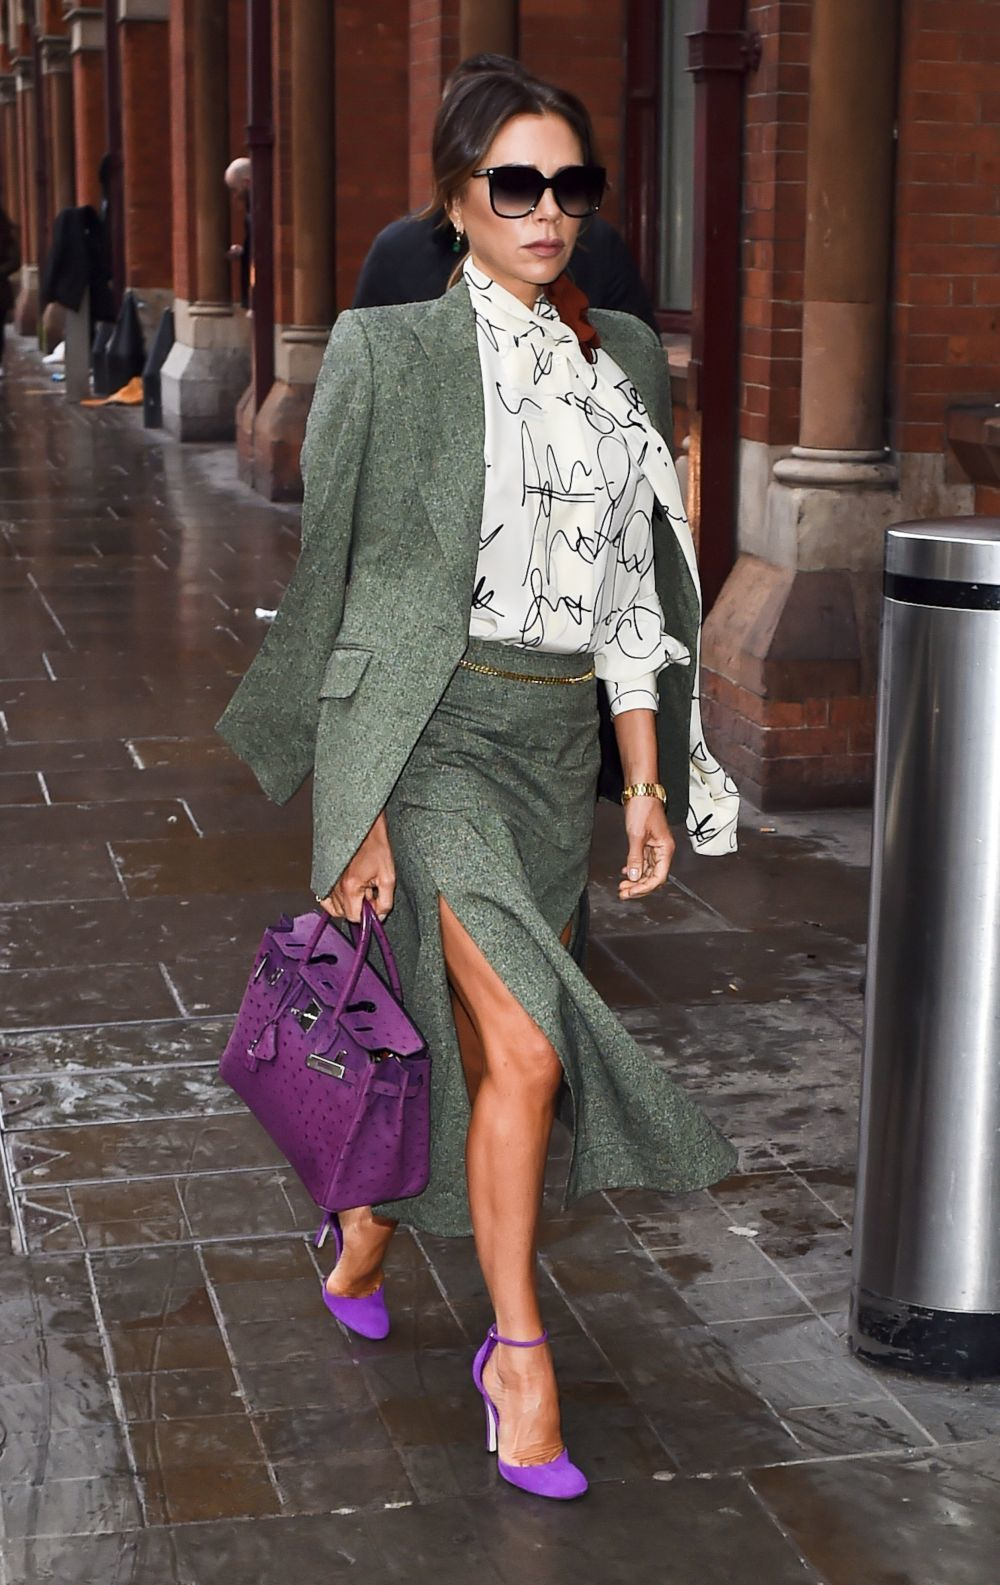 Victoria Beckham con accesorios en color morado.